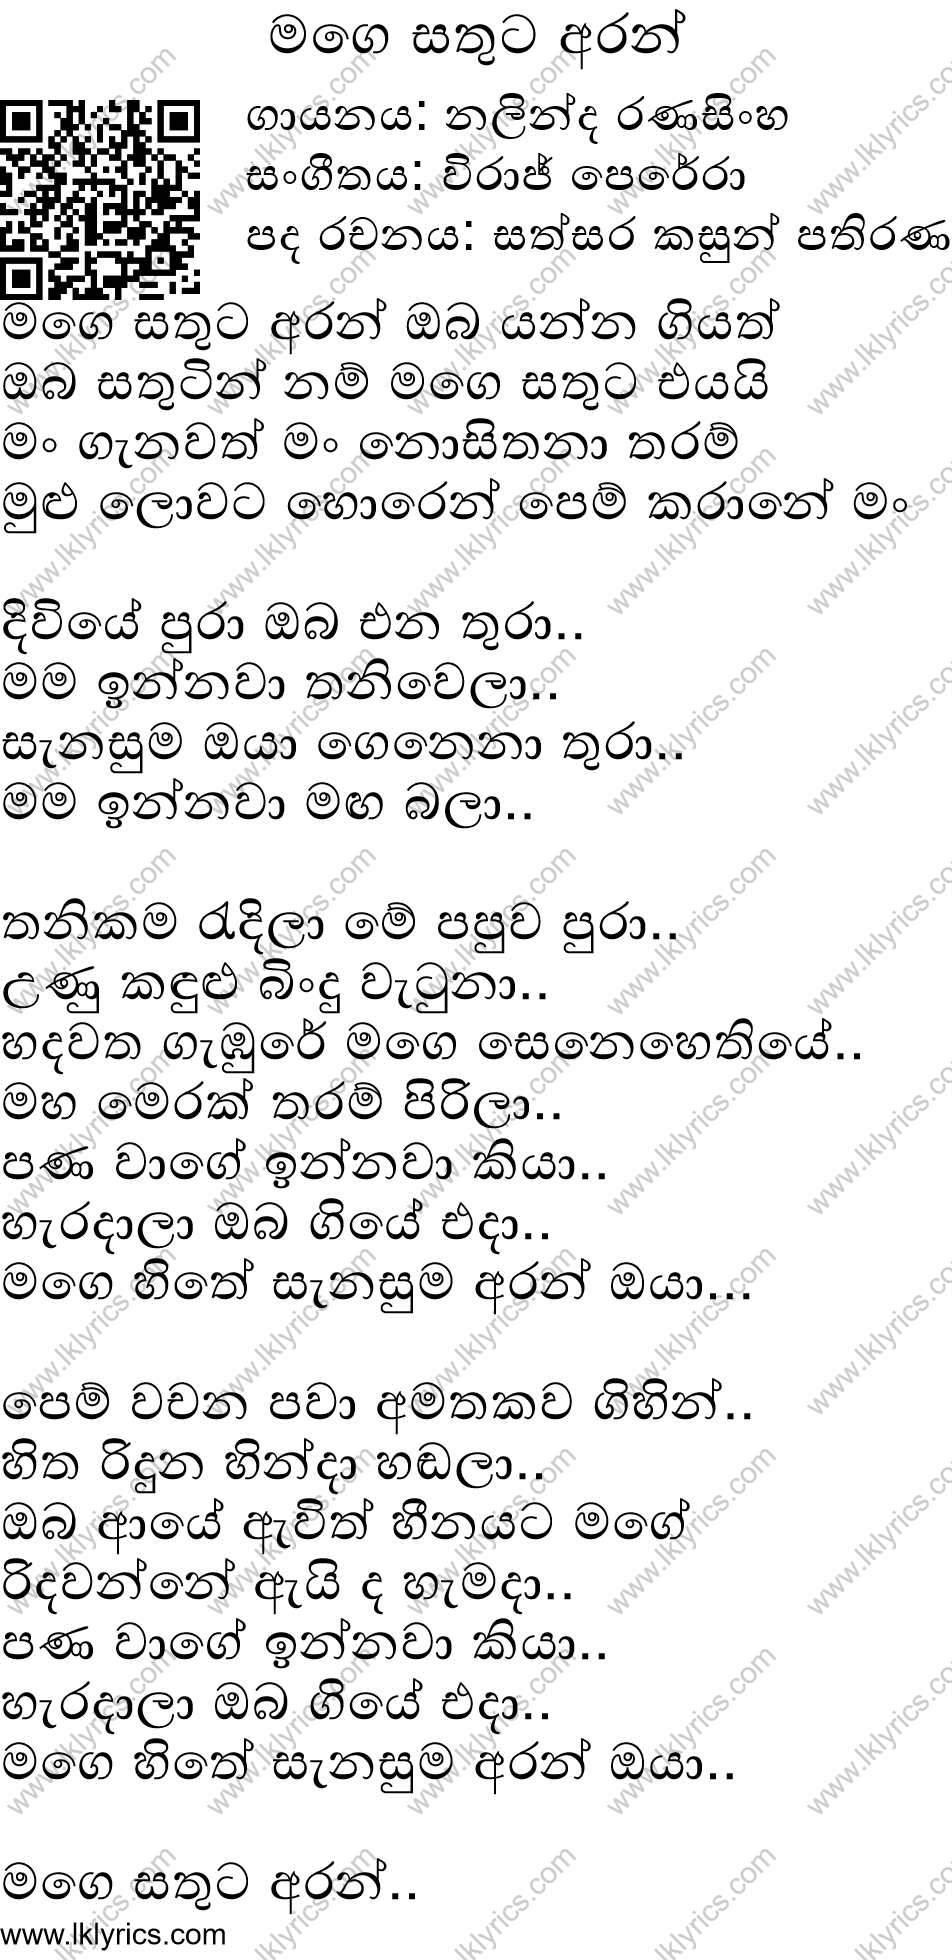 Mage Sathuta Aran Lyrics Lk Lyrics